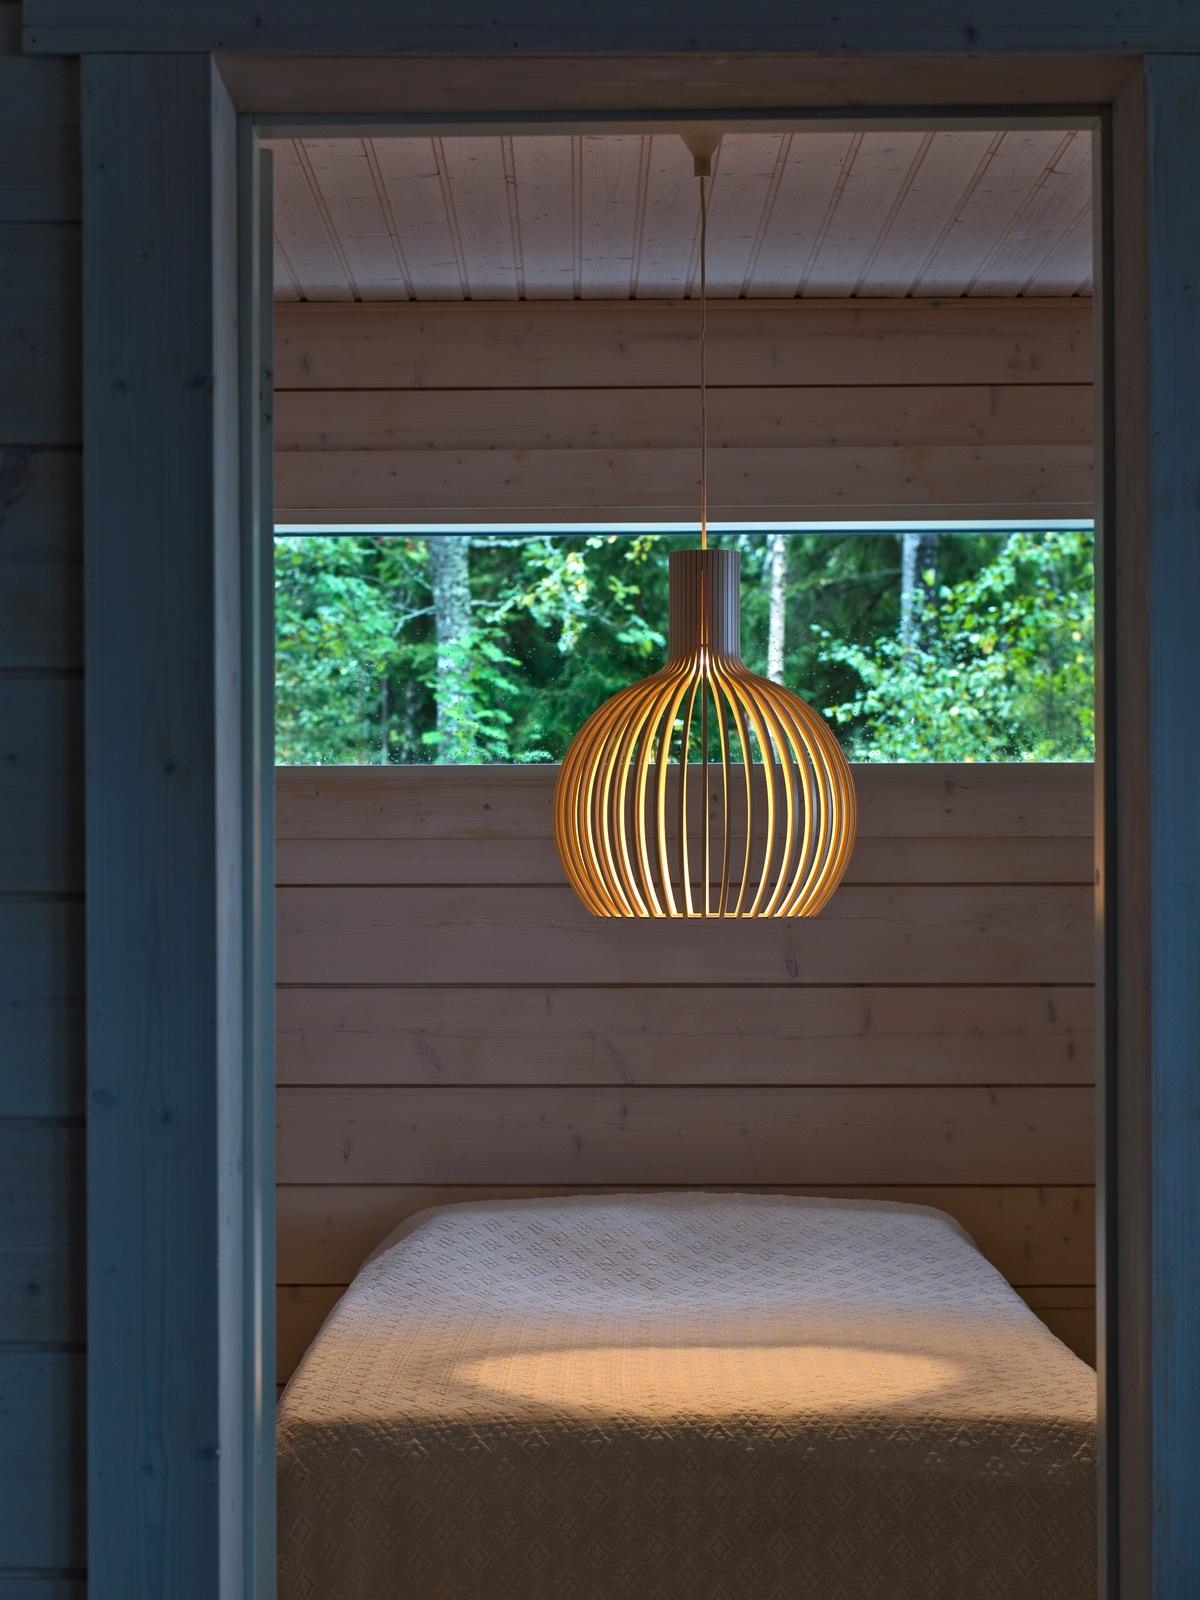 Octo 4241 small Secto Design skandinavische Holzleuchte DesignOrt Lampen Berlin Onlineshop